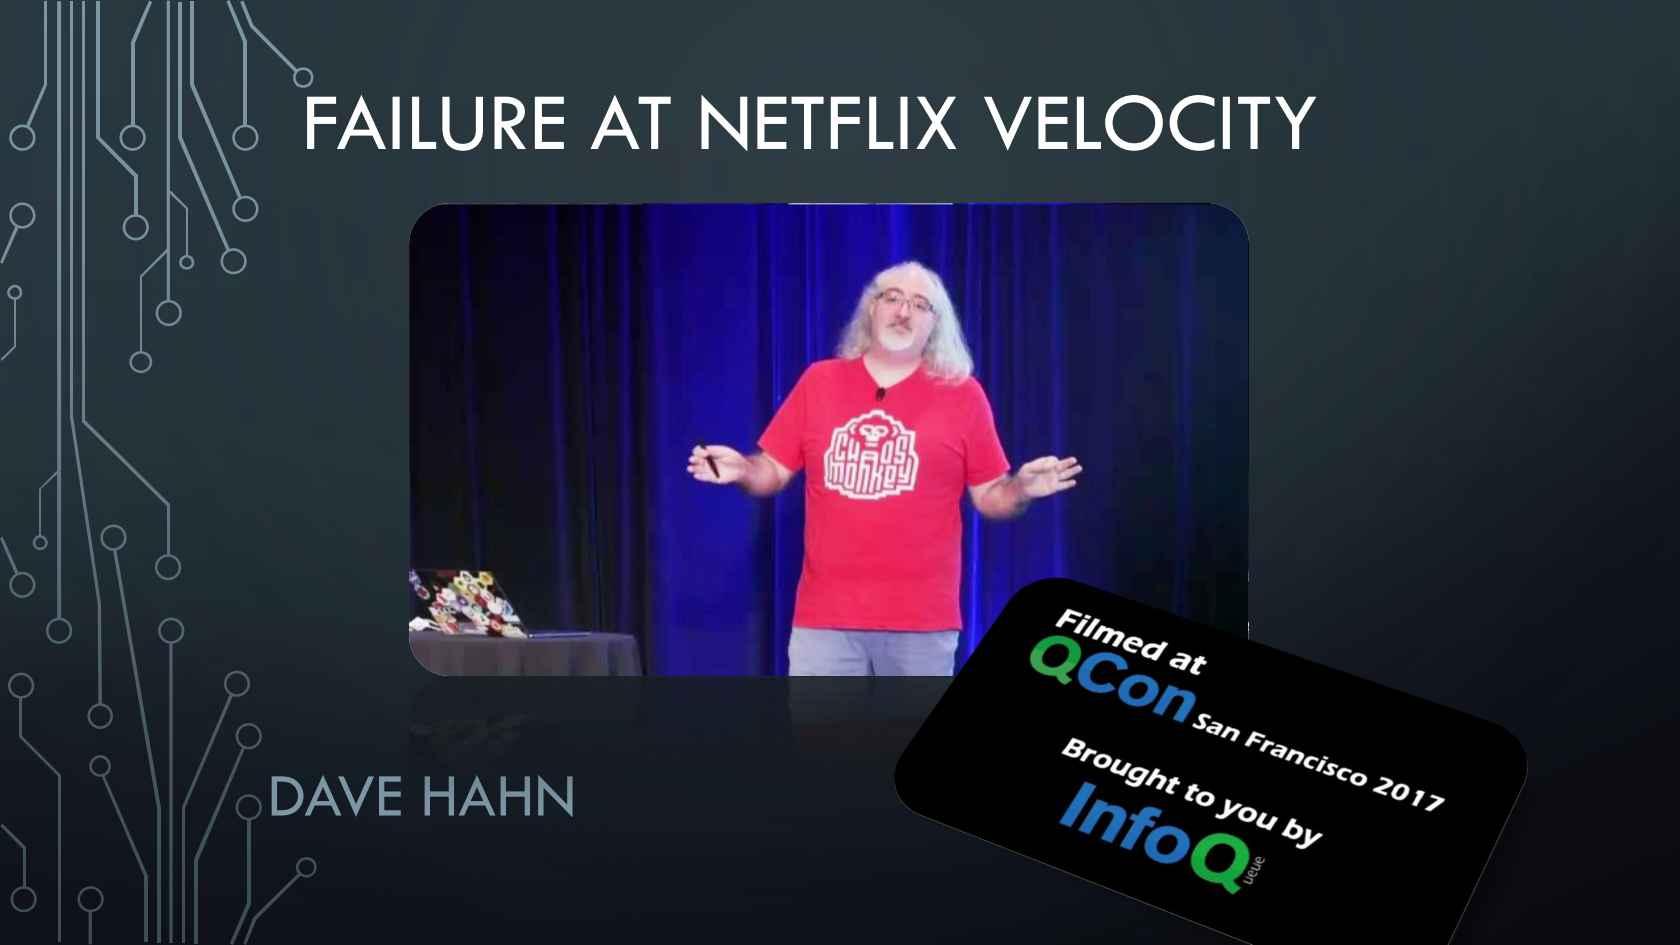 Incident Management at Netflix Velocity